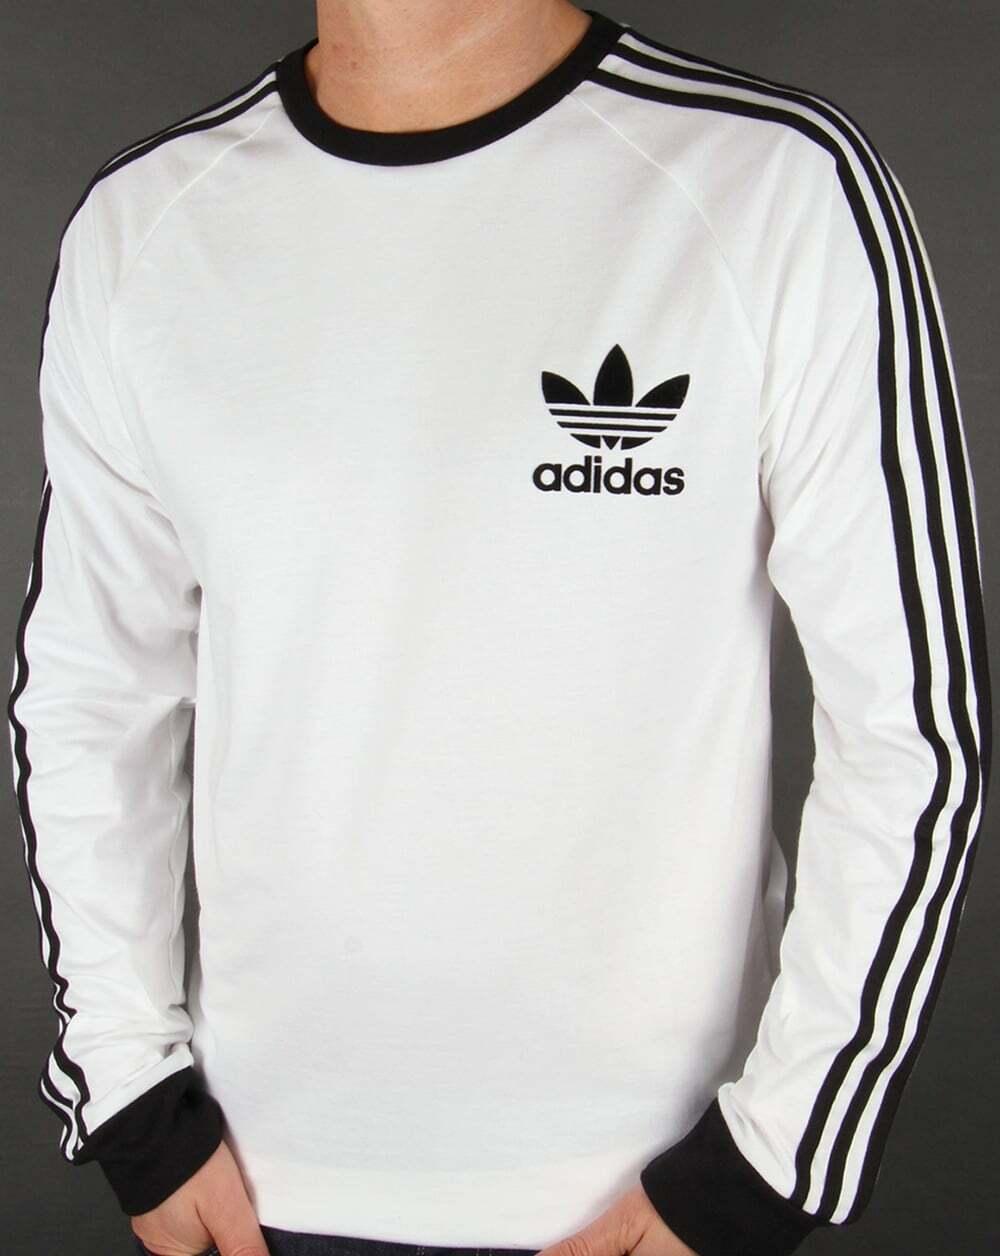 Adidas Men's Short-Long Sleeve Trefoil Logo Graphic T-Shirt